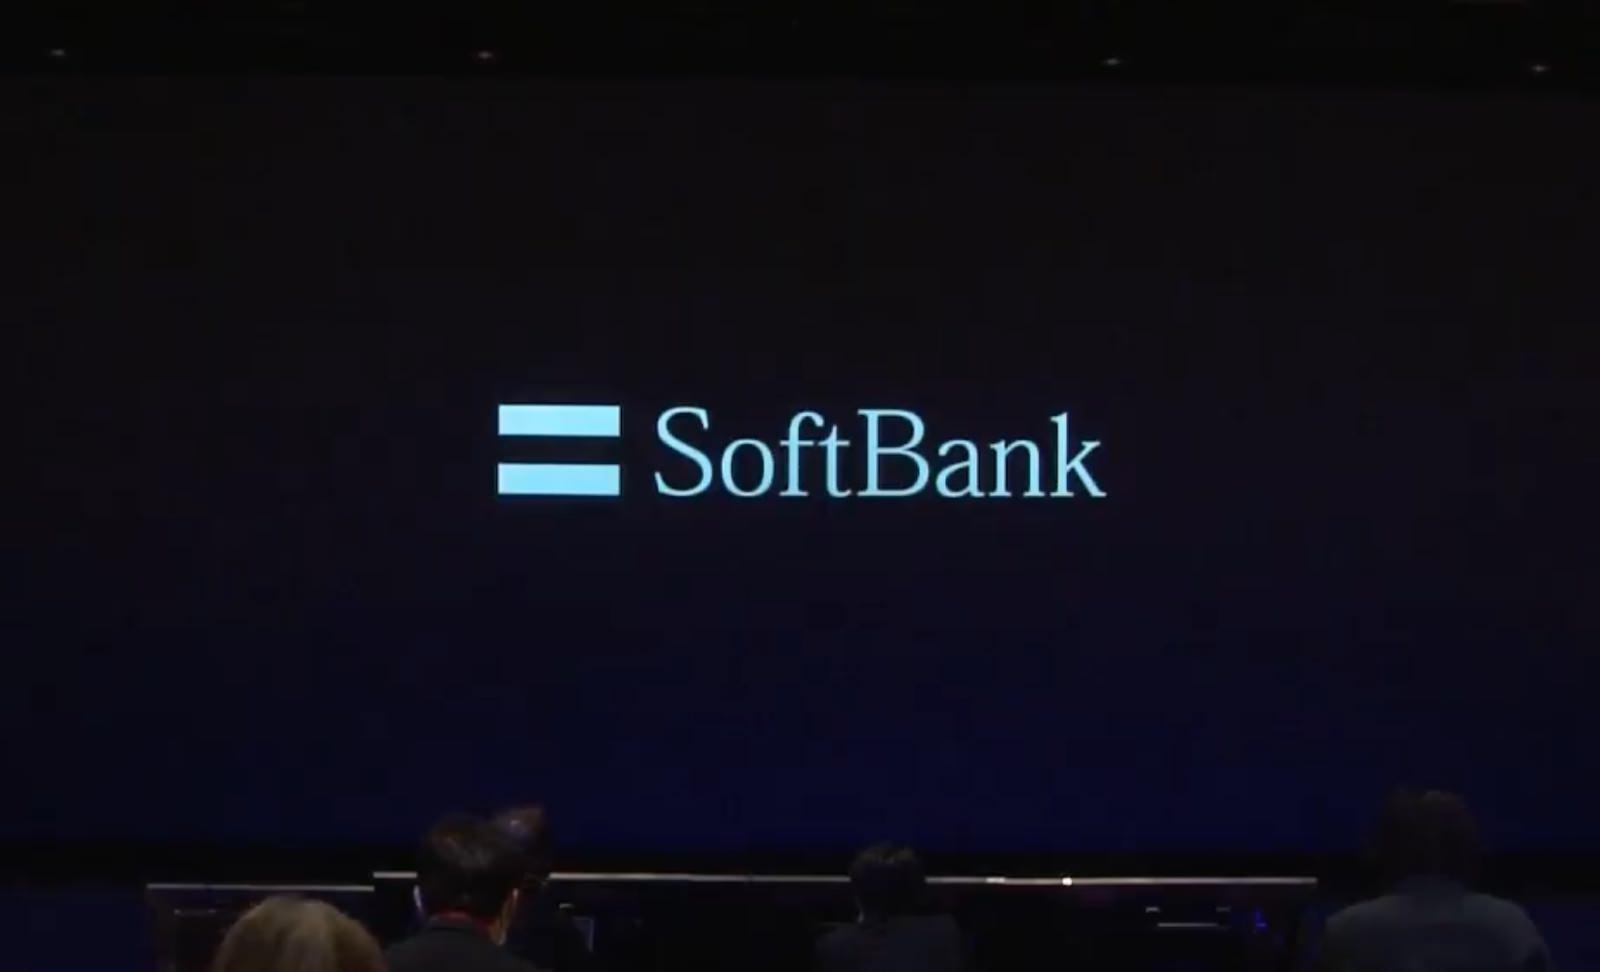 Softbank press event